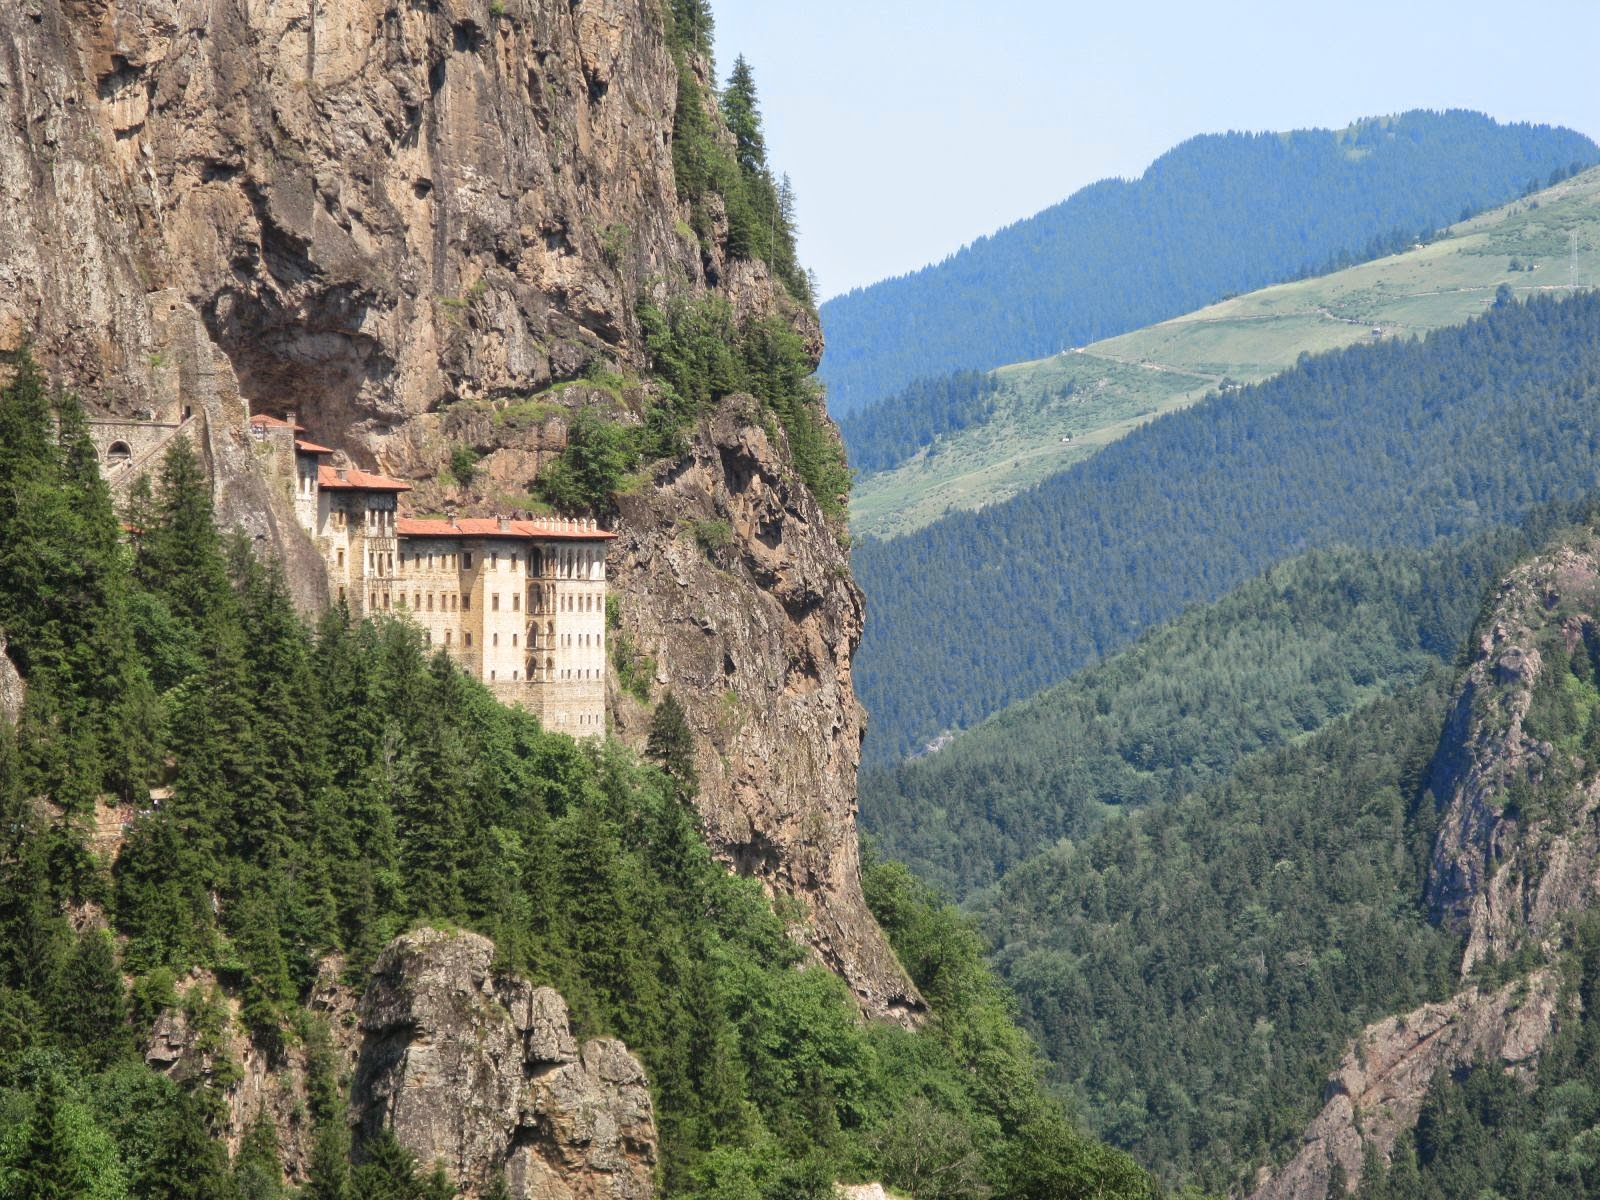 The Sumela Monastery